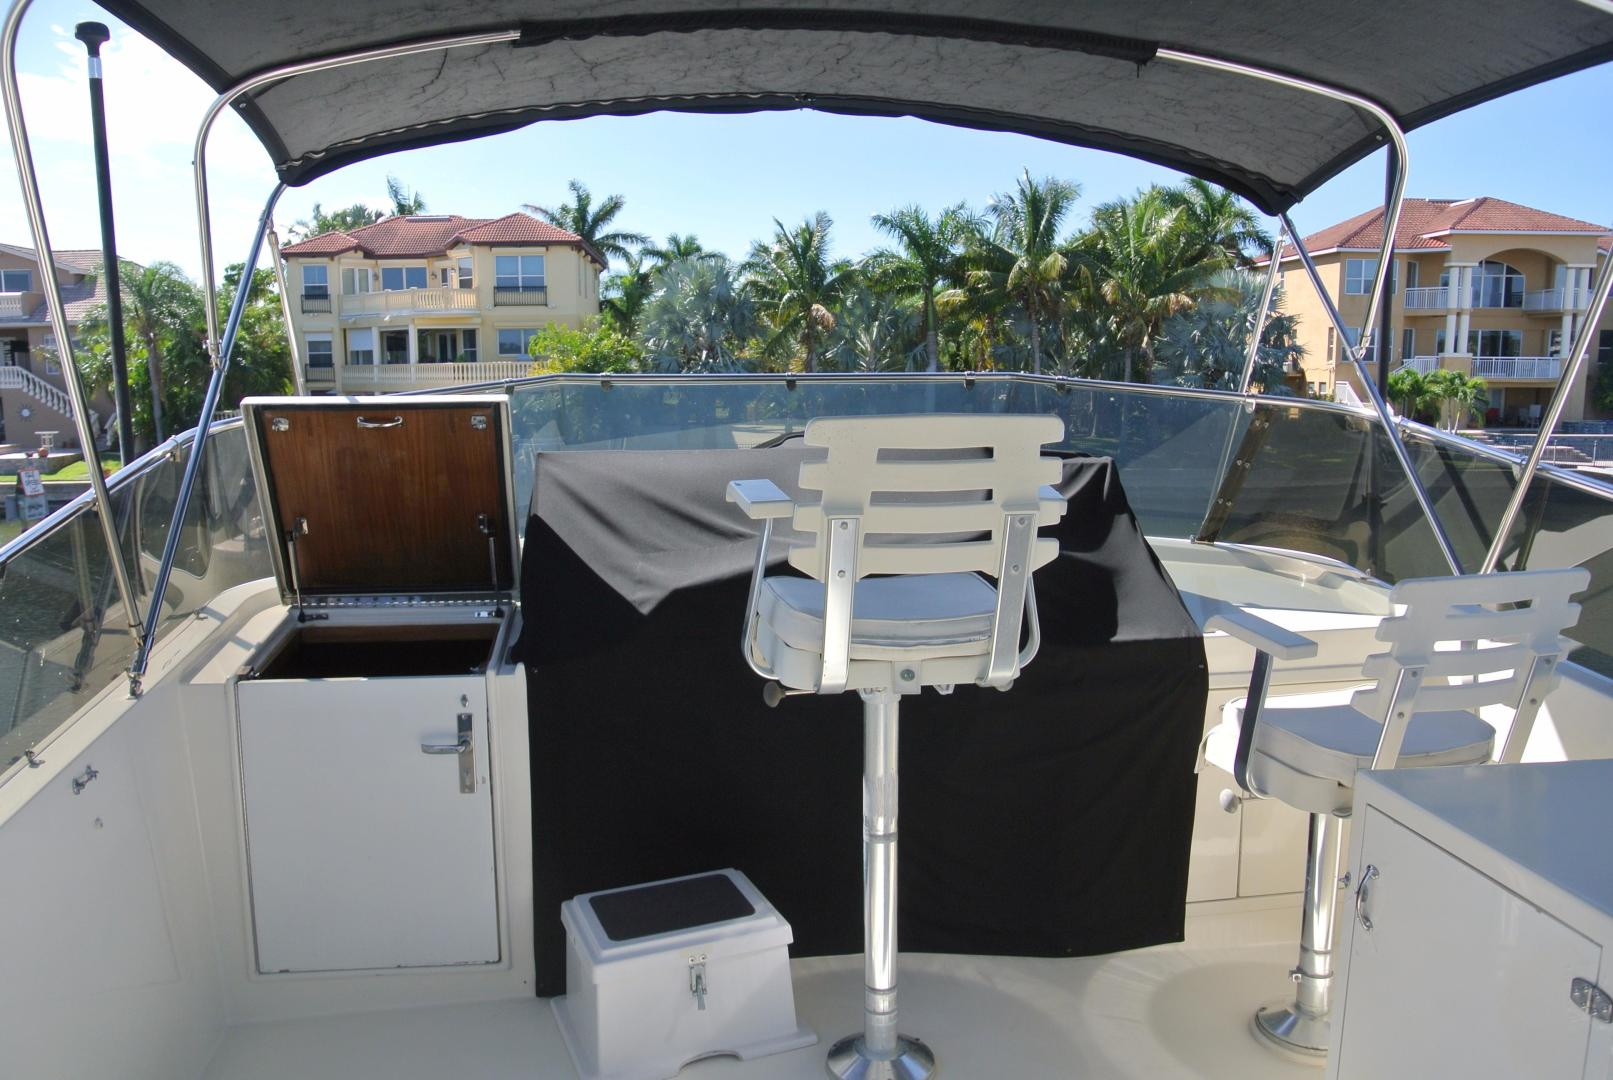 Hatteras-67-Cockpit-Motor-Yacht-1988-Lady-Encore-Saint-Petersburg-Florida-United-States-Fly-Bridge-926182